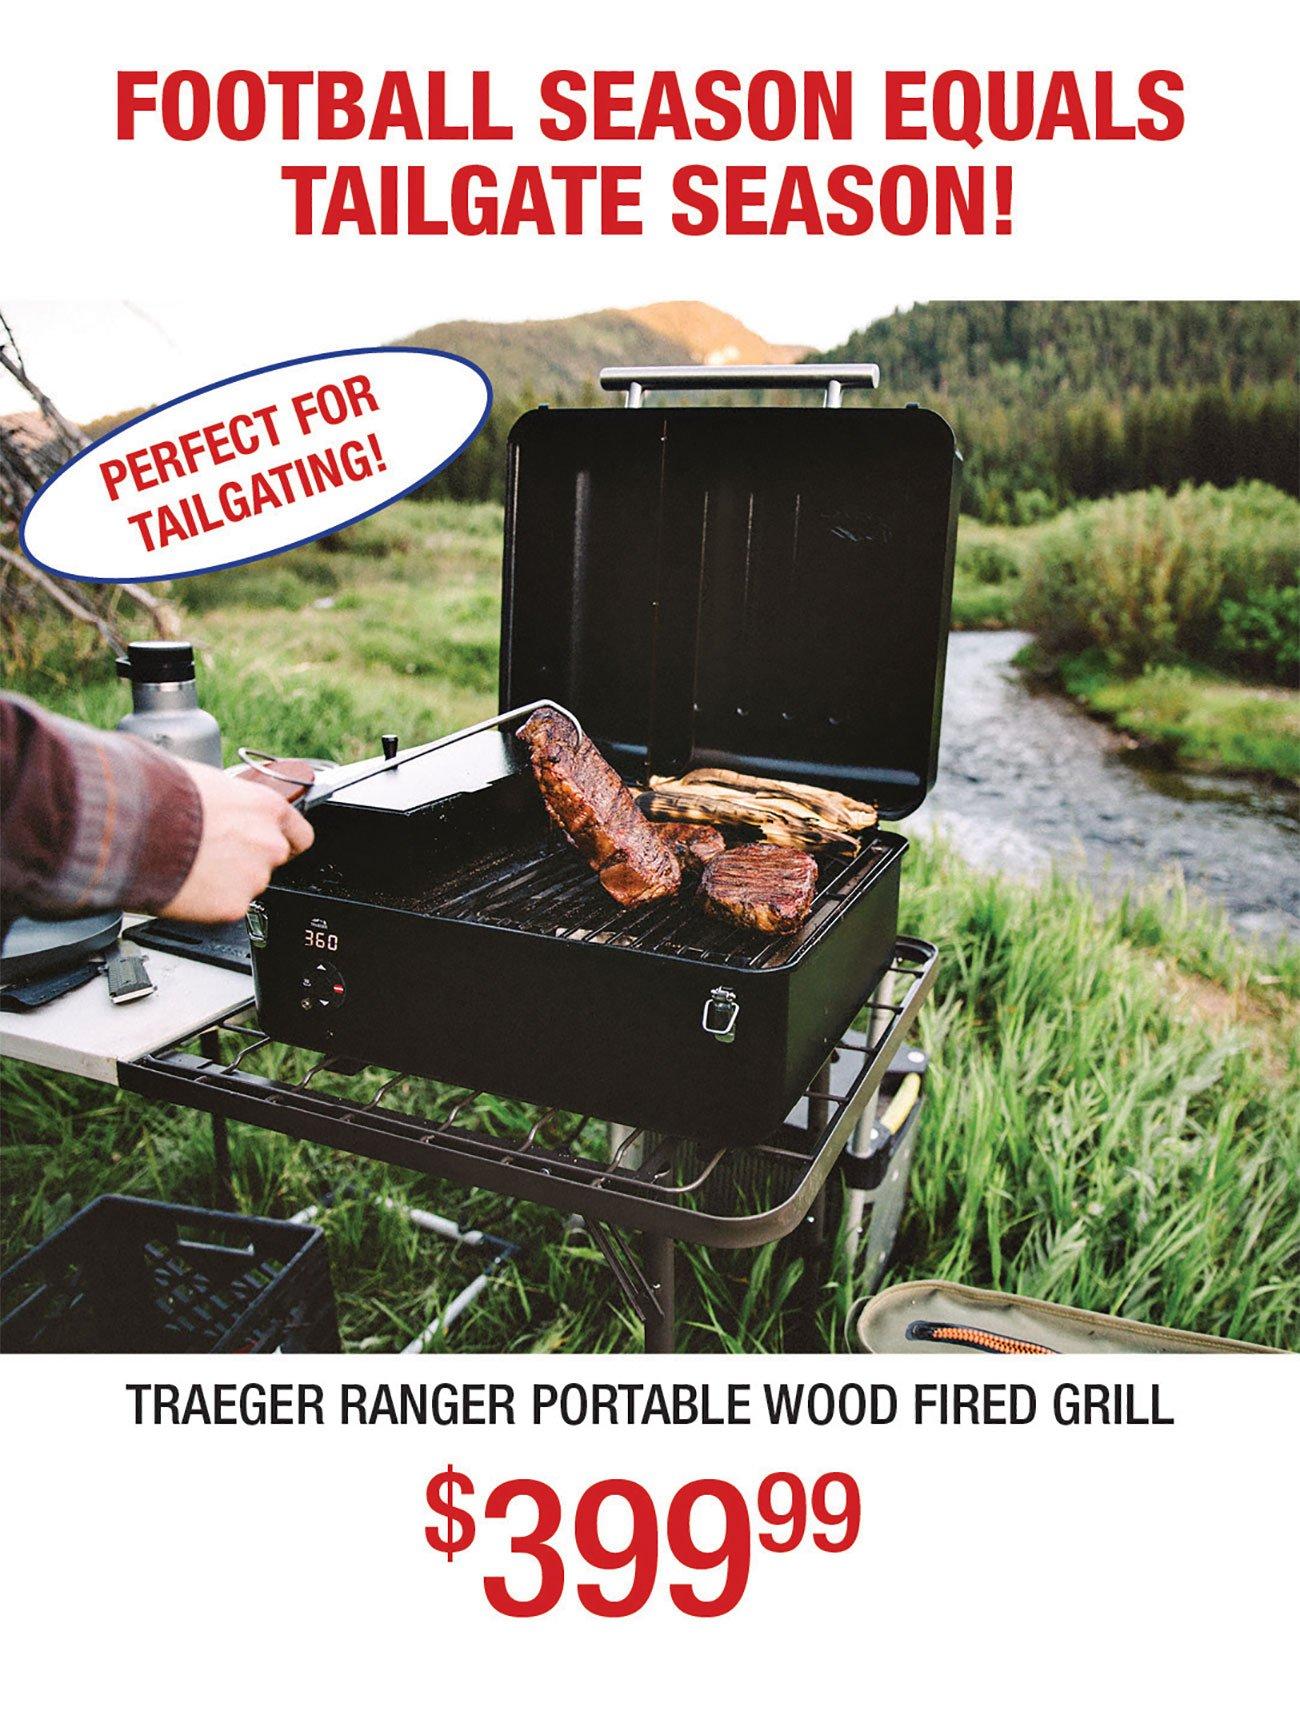 Traeger-Ranger-Portable-Grill